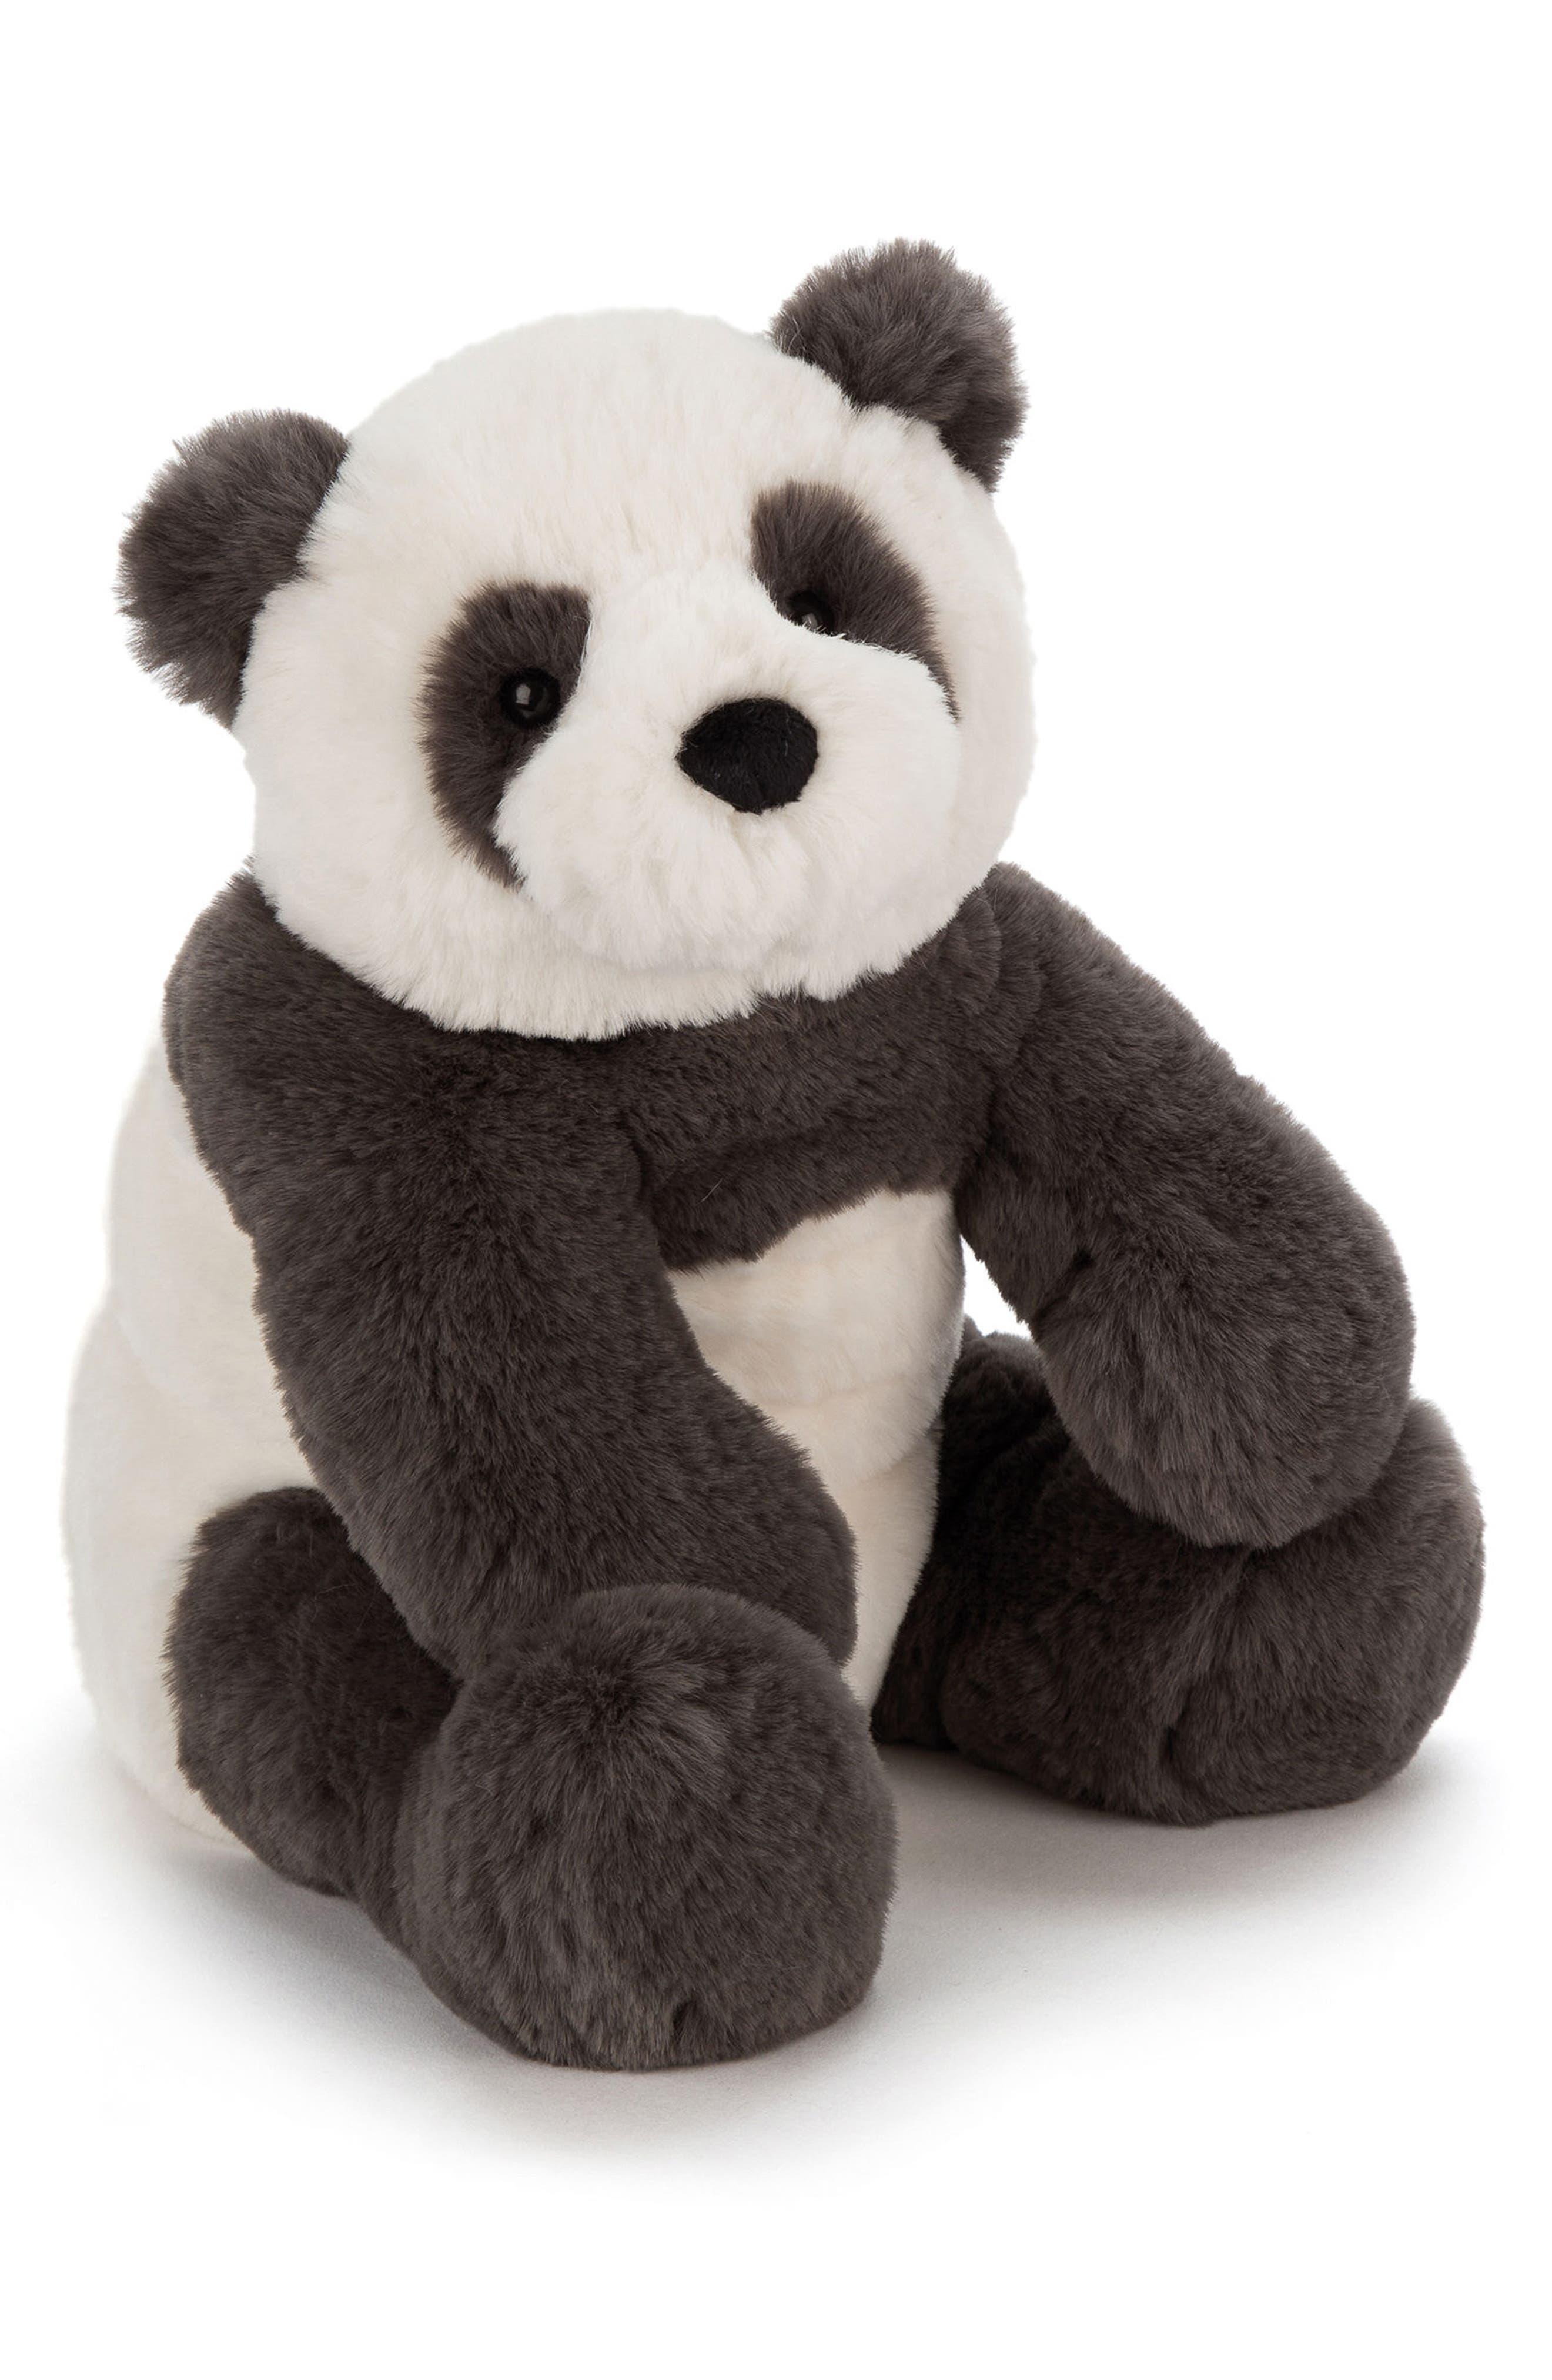 Large Harry Panda Stuffed Animal,                             Main thumbnail 1, color,                             BLACK / CREAM